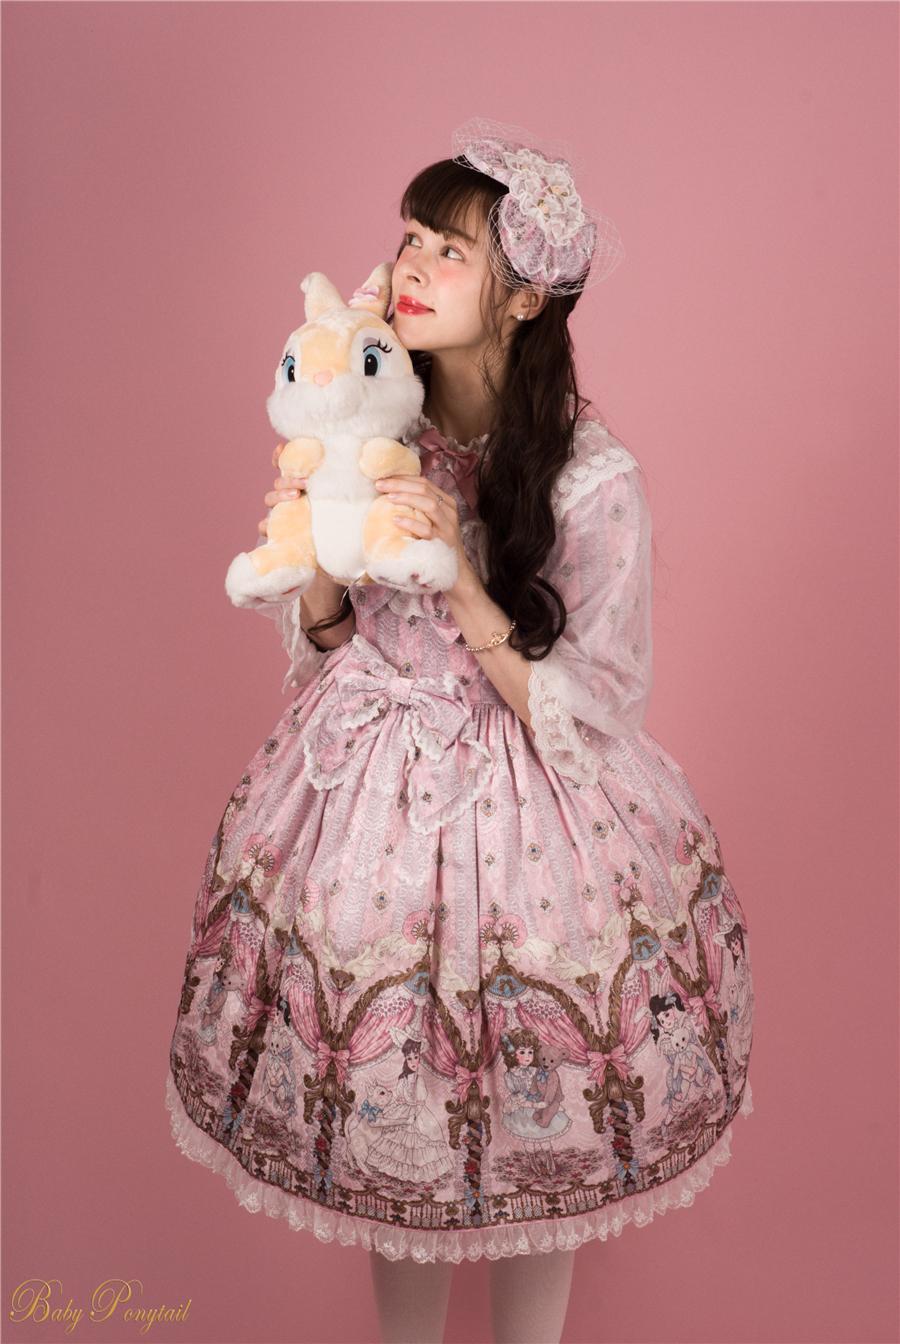 BabyPonytail_Model Photo_My Favorite Companion_OP Pink_3.jpg